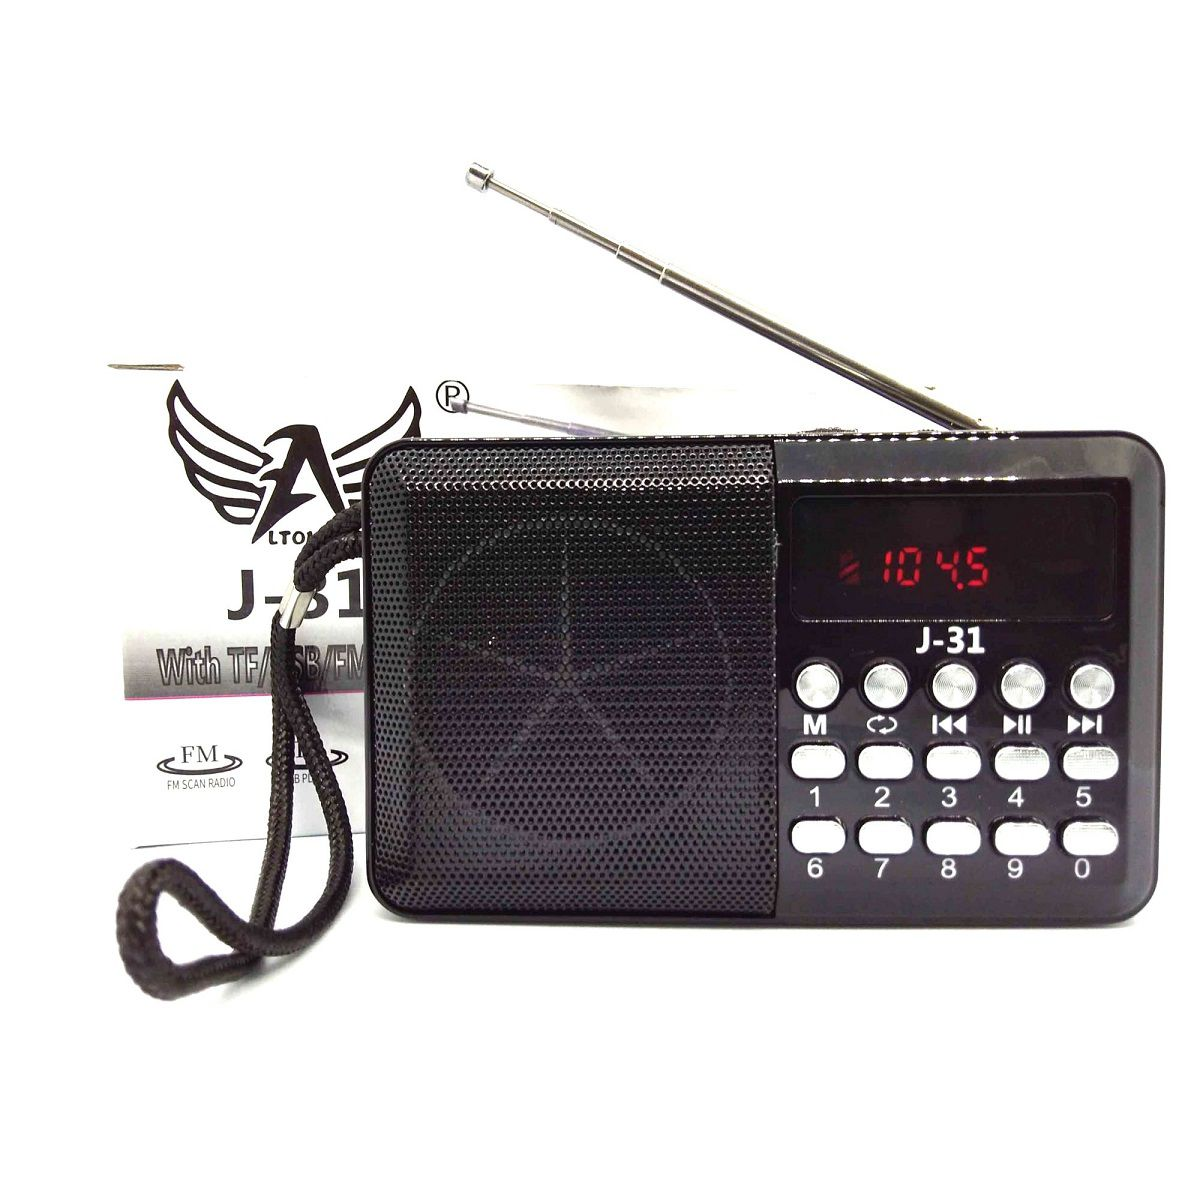 Rádio Digital De Bolso Portátil FM TF USB Hora Recarregável J-31 Altomex Preto